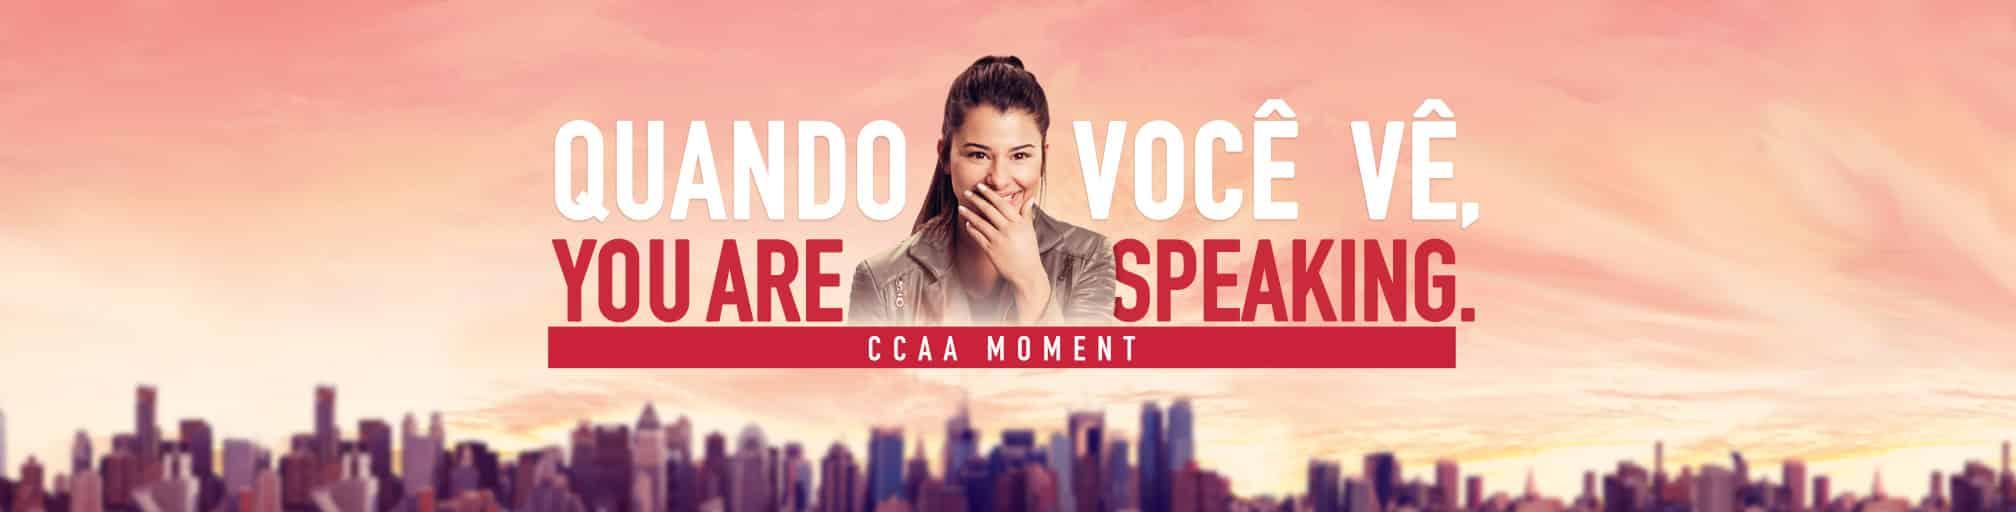 Campanha CCAA 2017